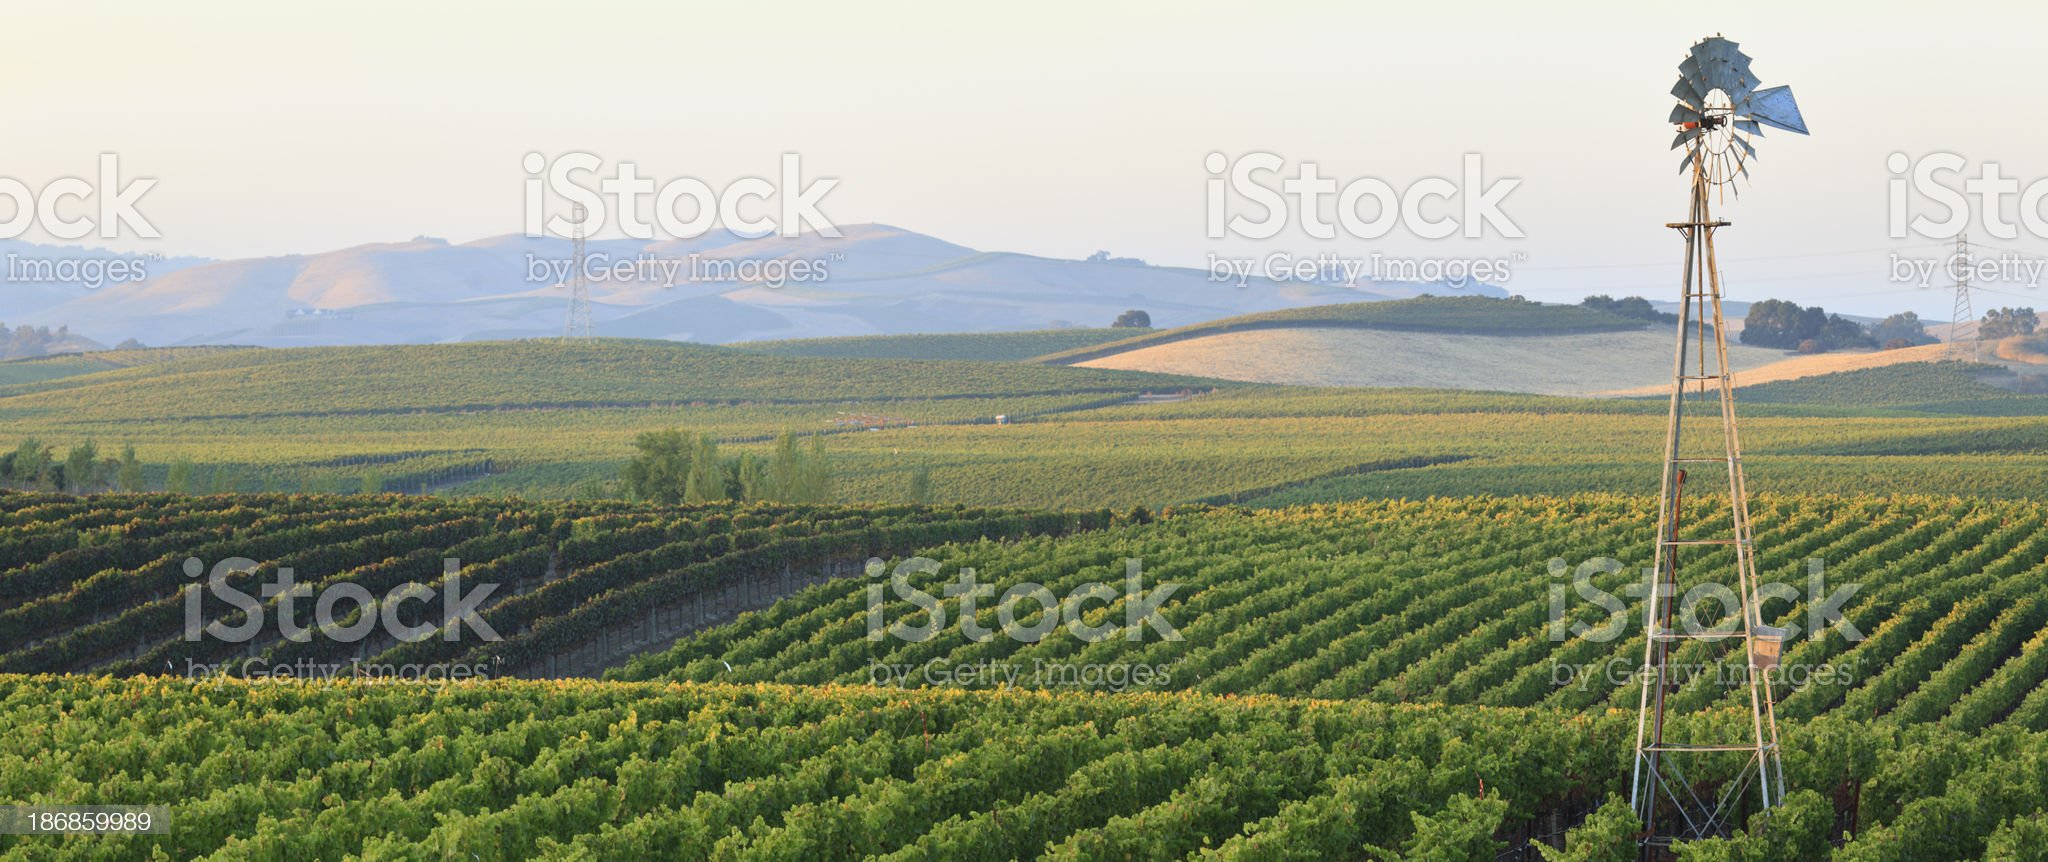 Panoramic Vineyard Landscape royalty-free stock photo